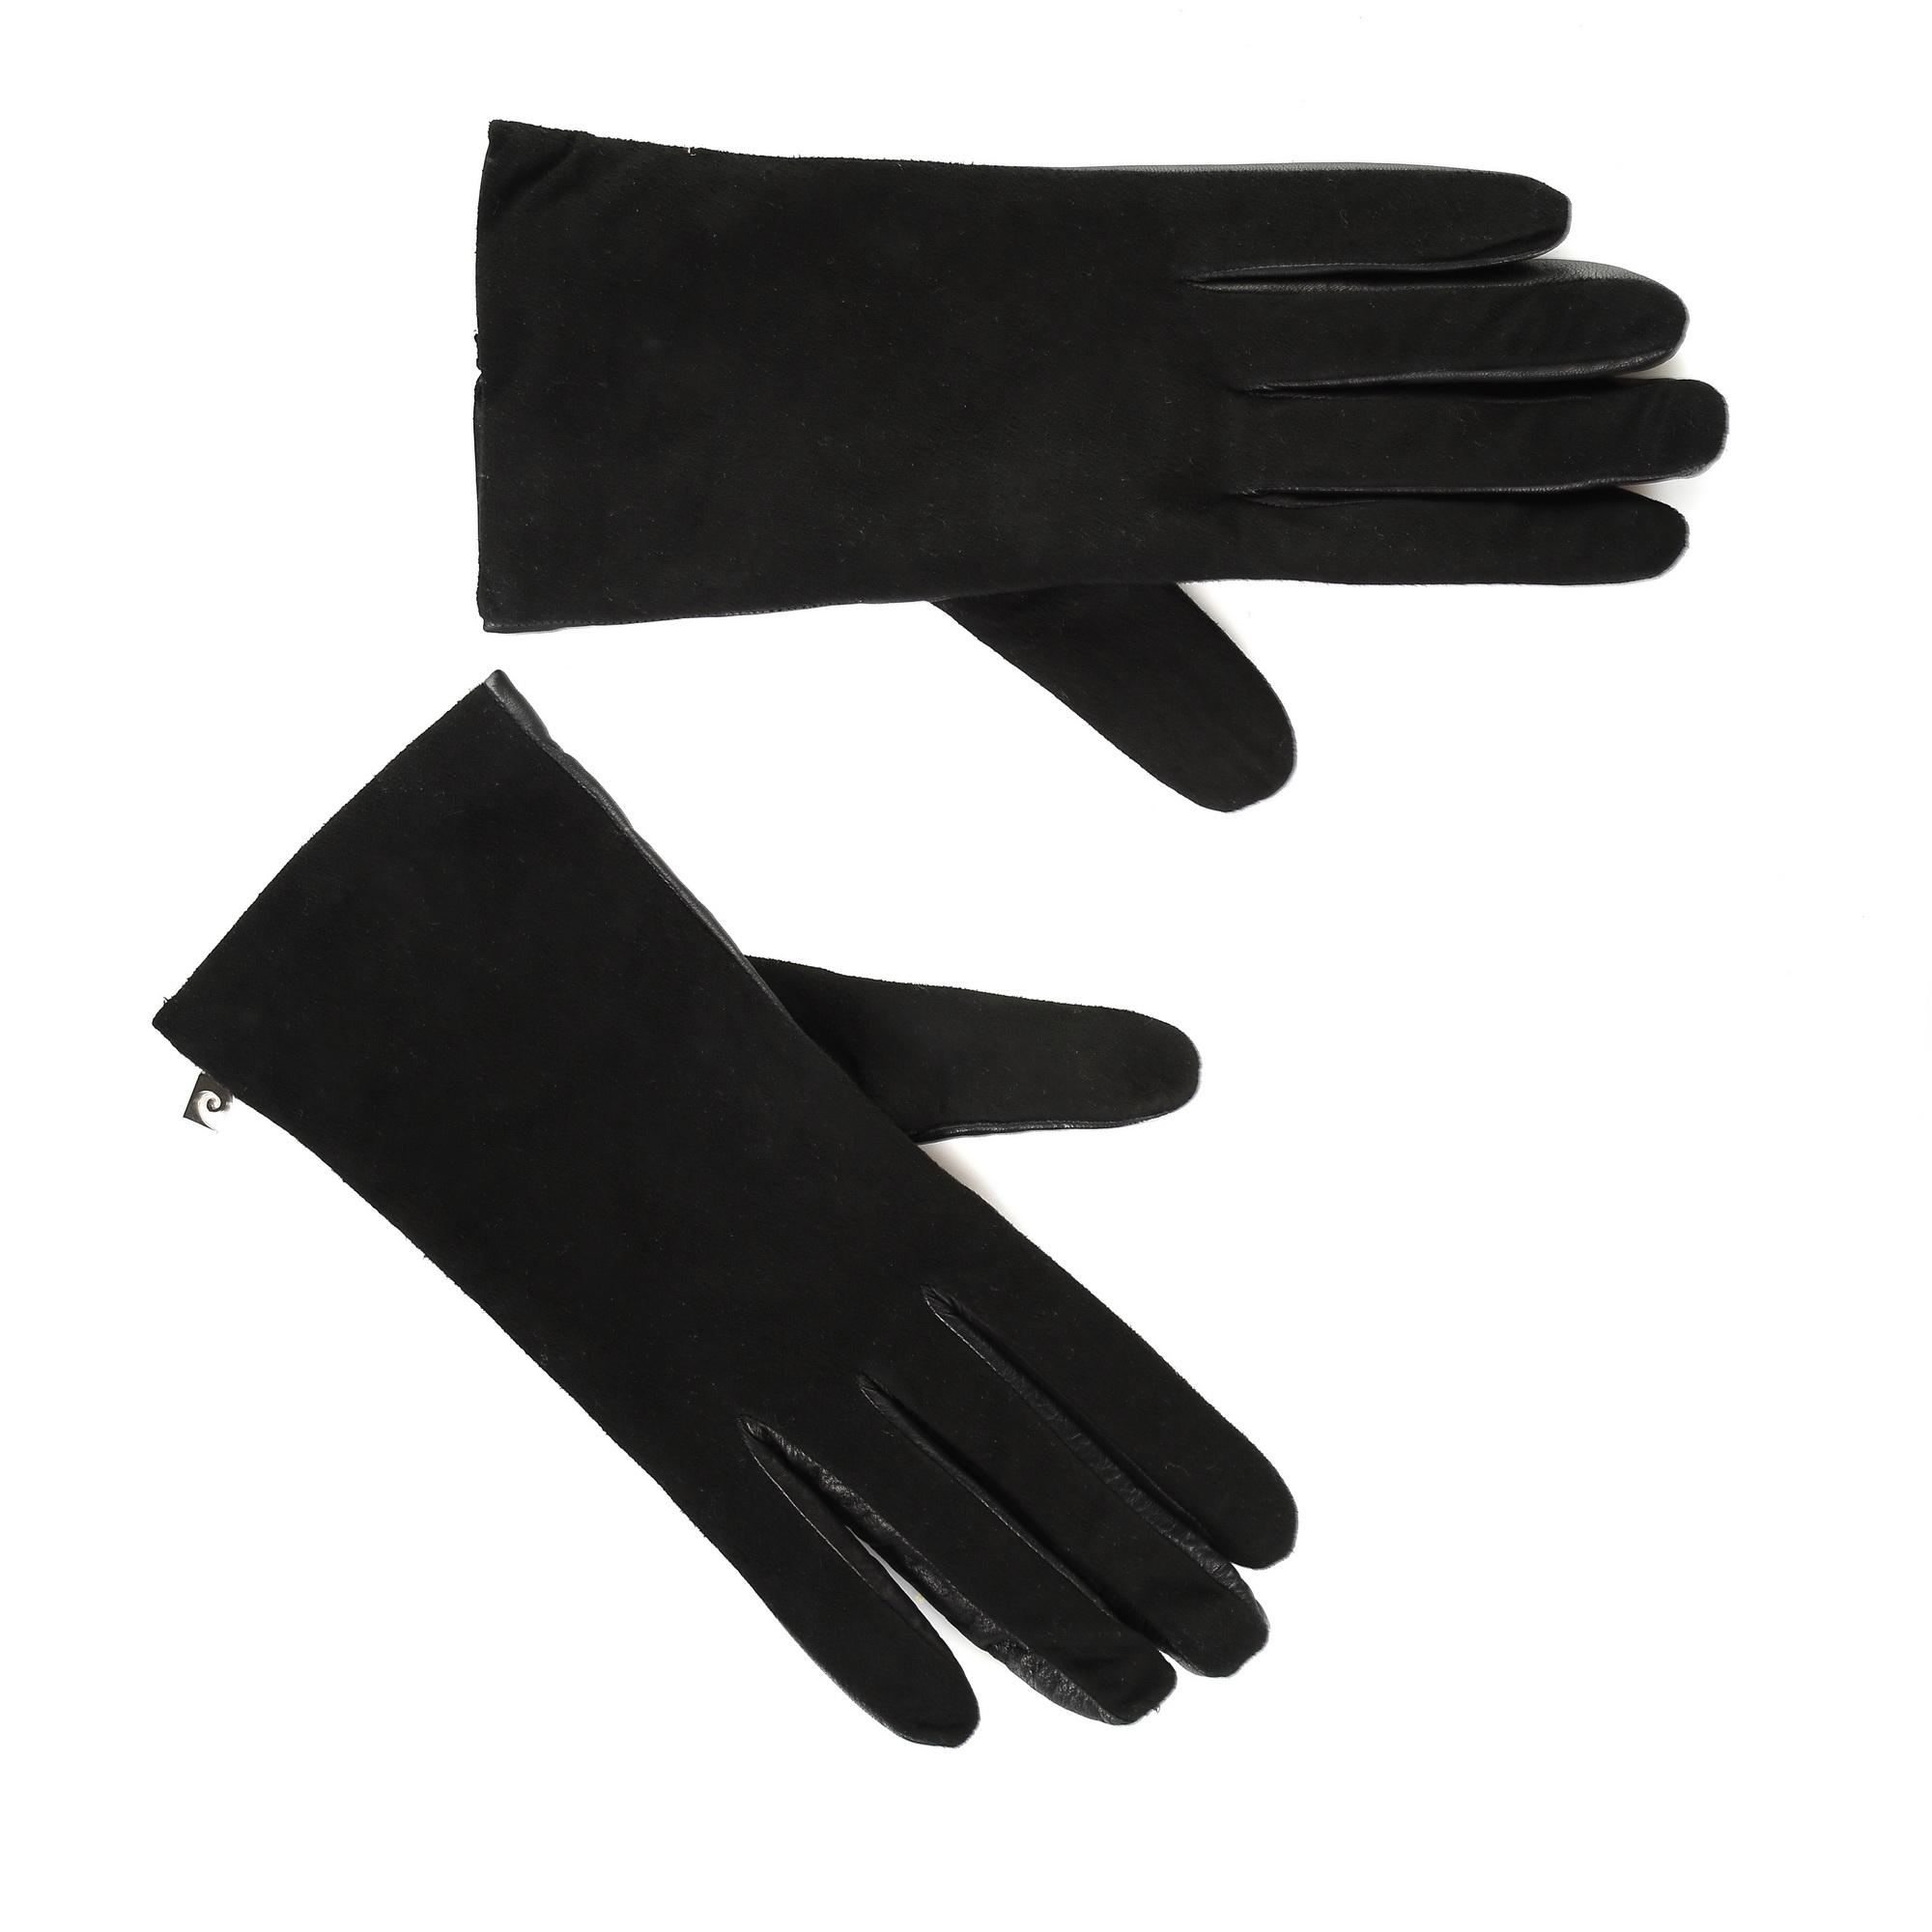 Suede Δερμάτινα Γάντια Pierre Cardin γυναικα   γυναικείο γάντι